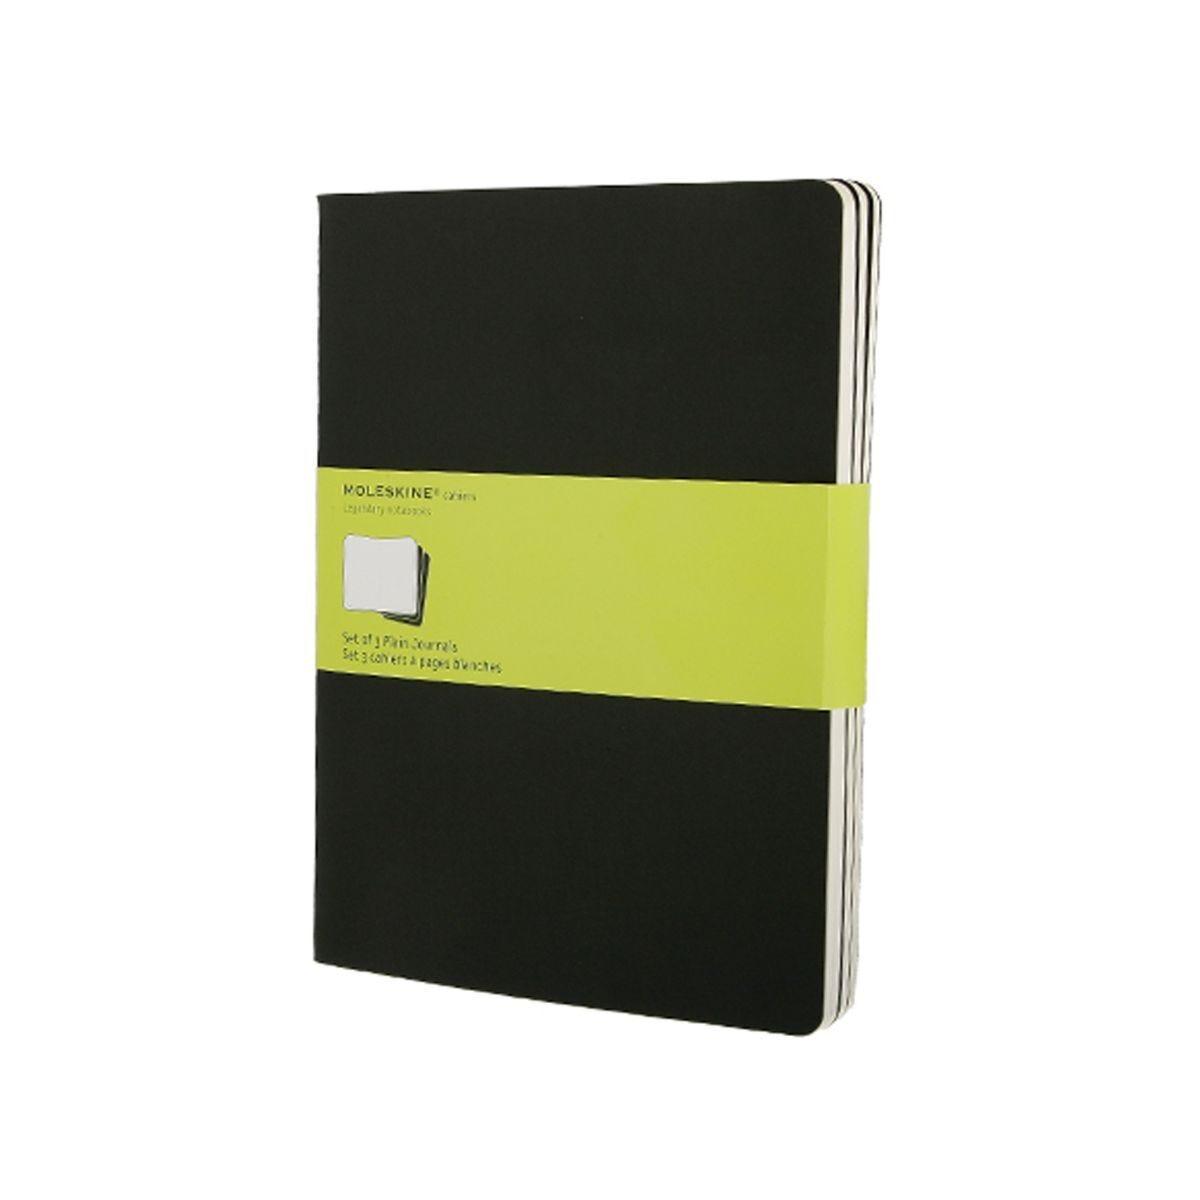 Moleskine Cahier Notebook XL Plain Pack of 3 Black